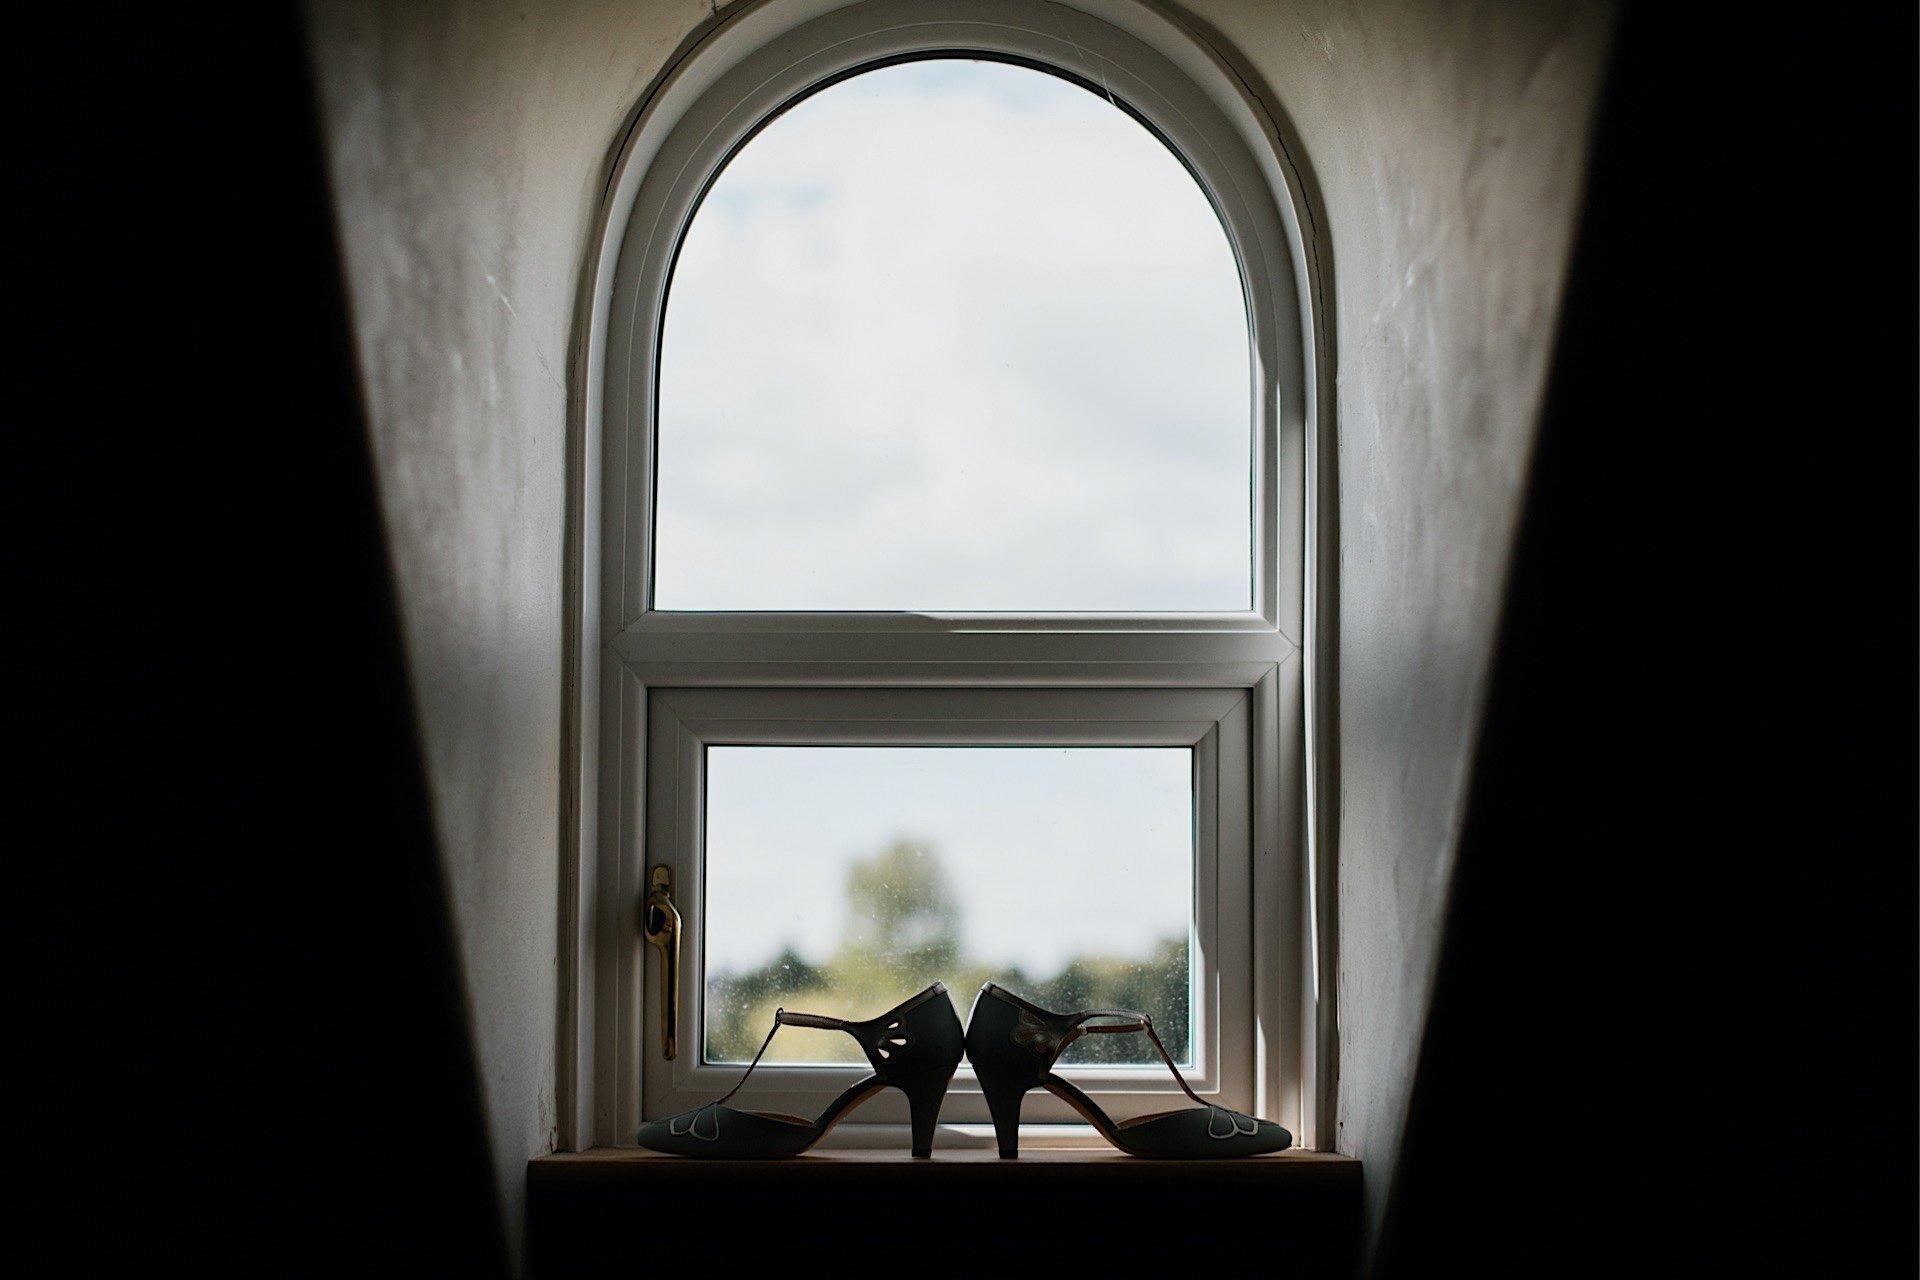 wedding shoes in window